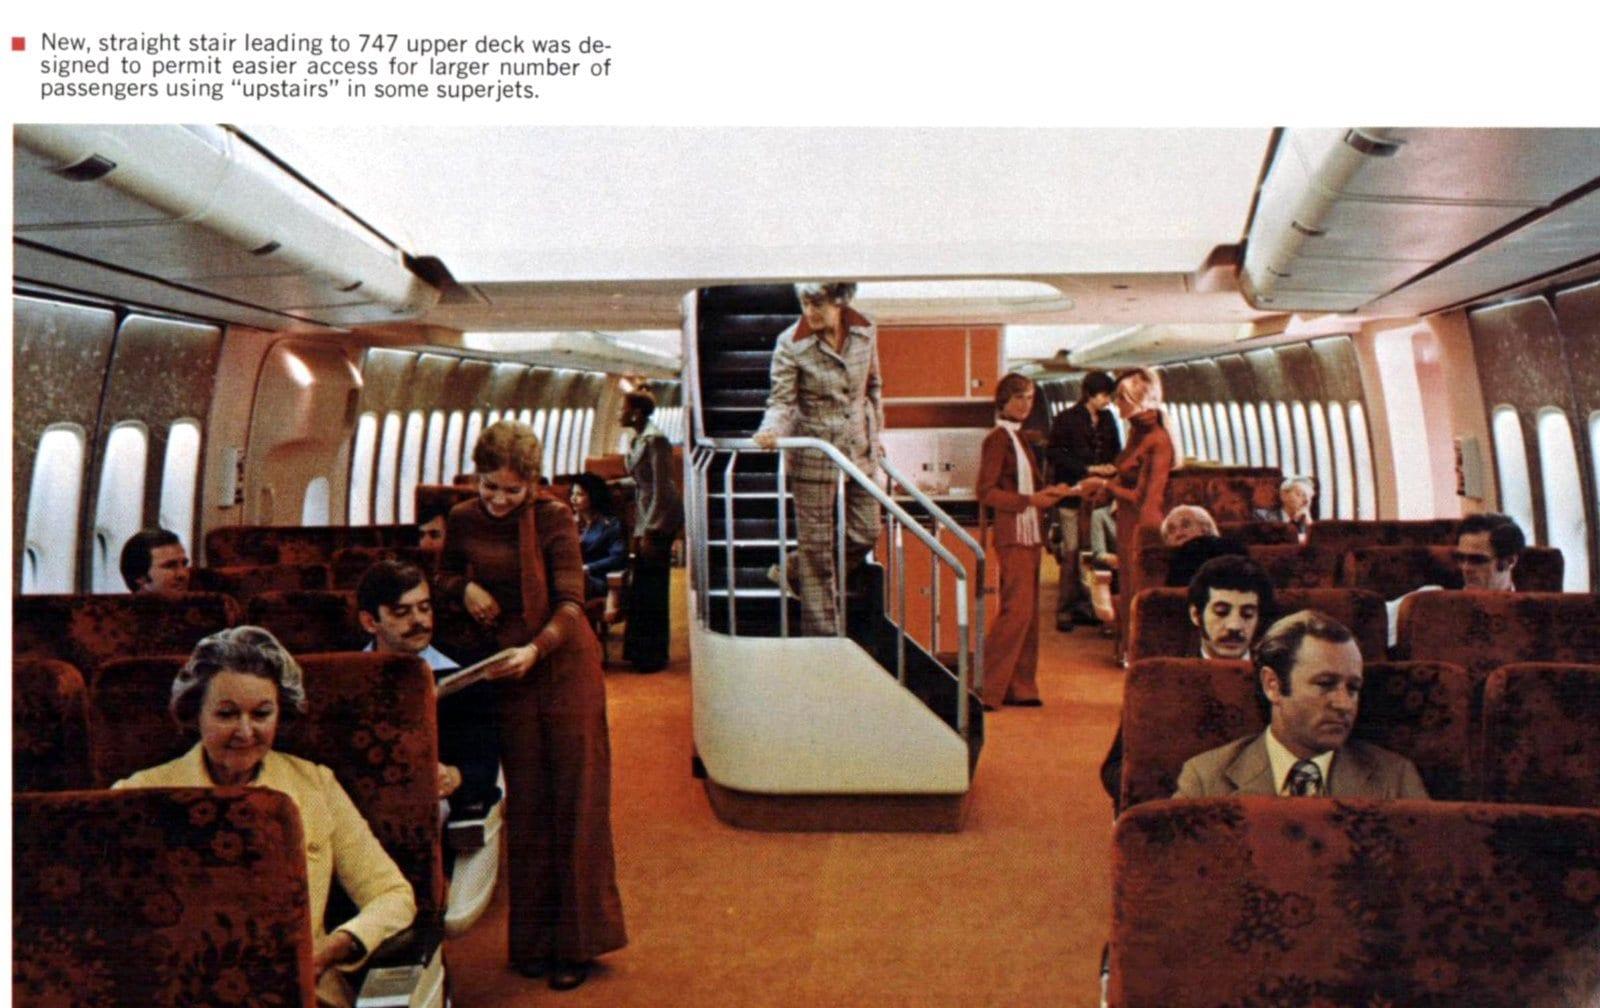 Inside passenger stairway on vintage Boeing 747 plane (1975)